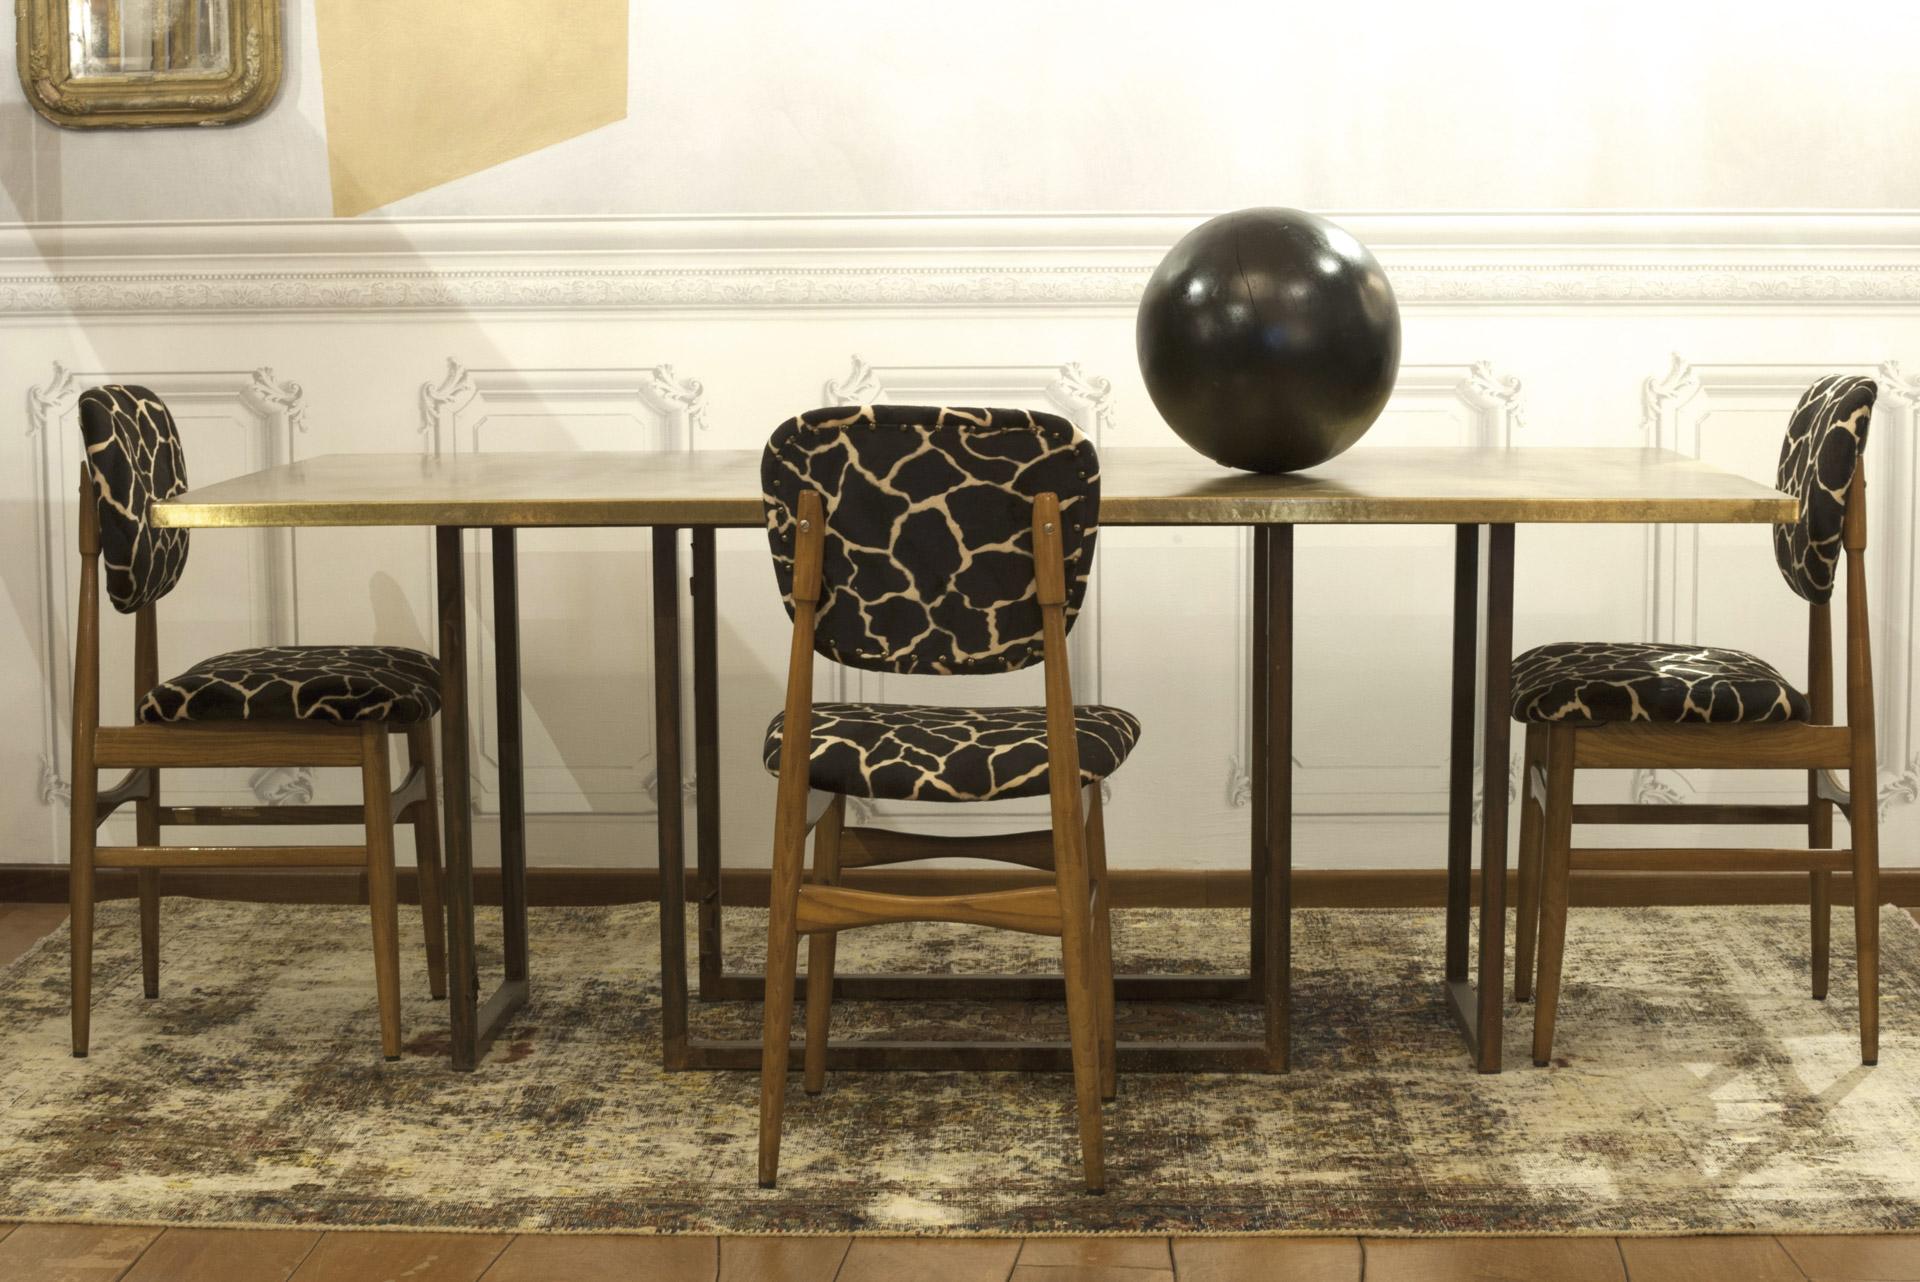 chiara-castelli-casa-interior-designer-bologna_c7.jpg